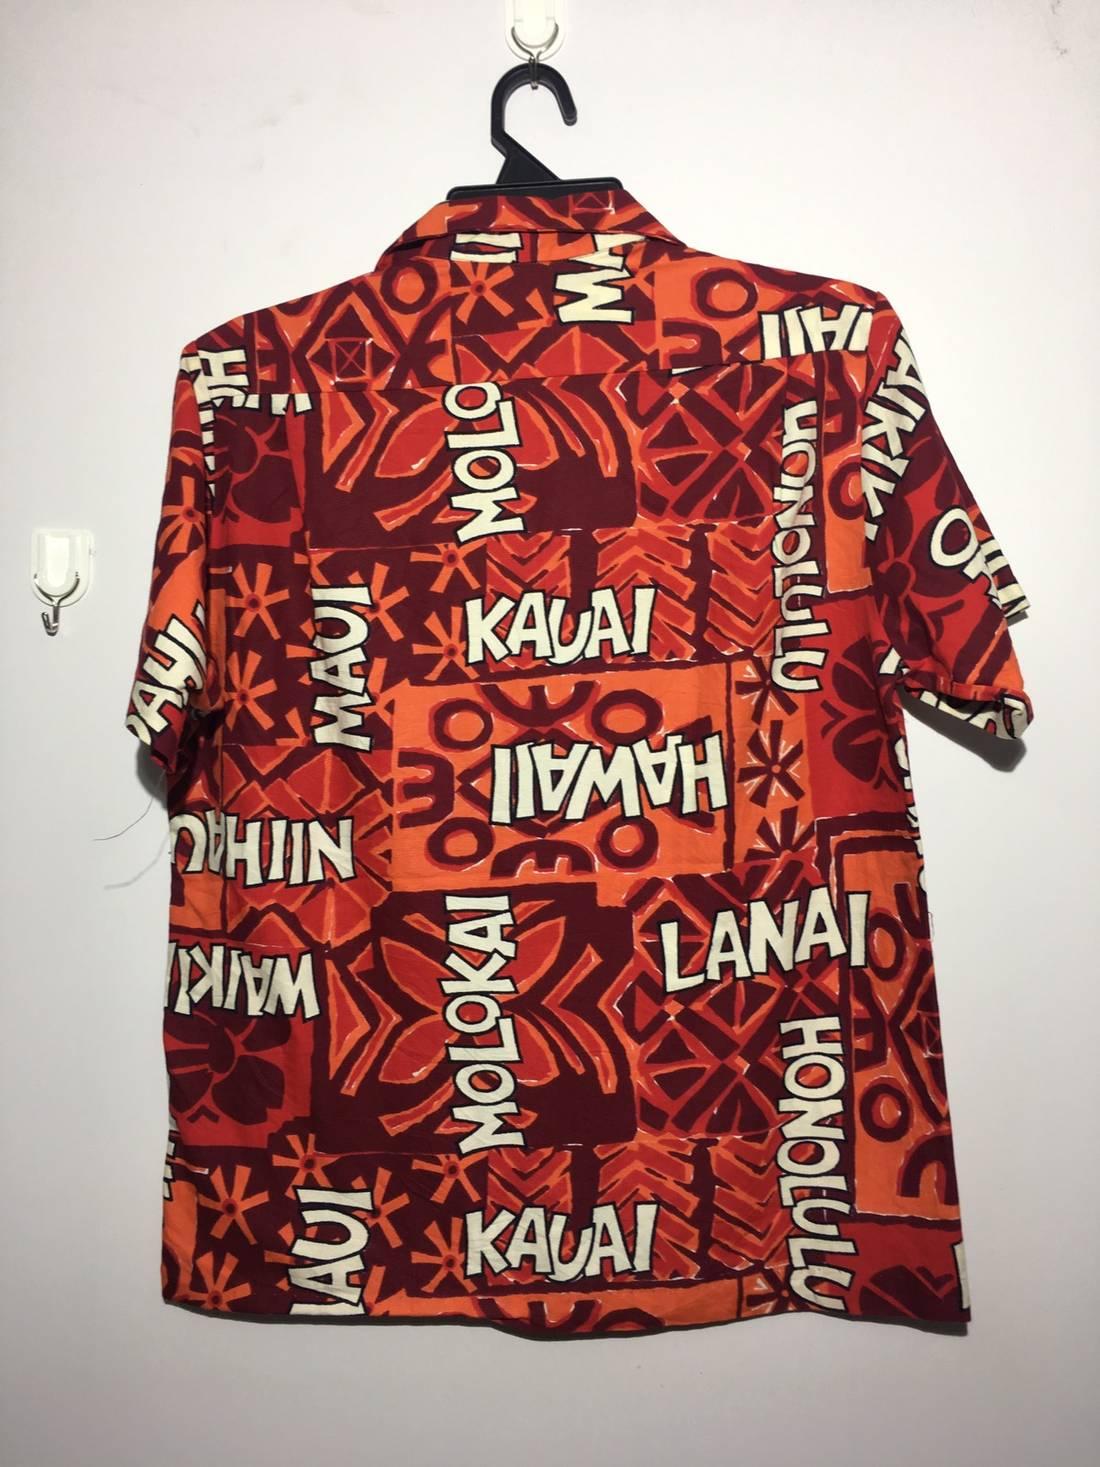 b1cf475502 Where To Buy Hawaiian Shirts In Kauai